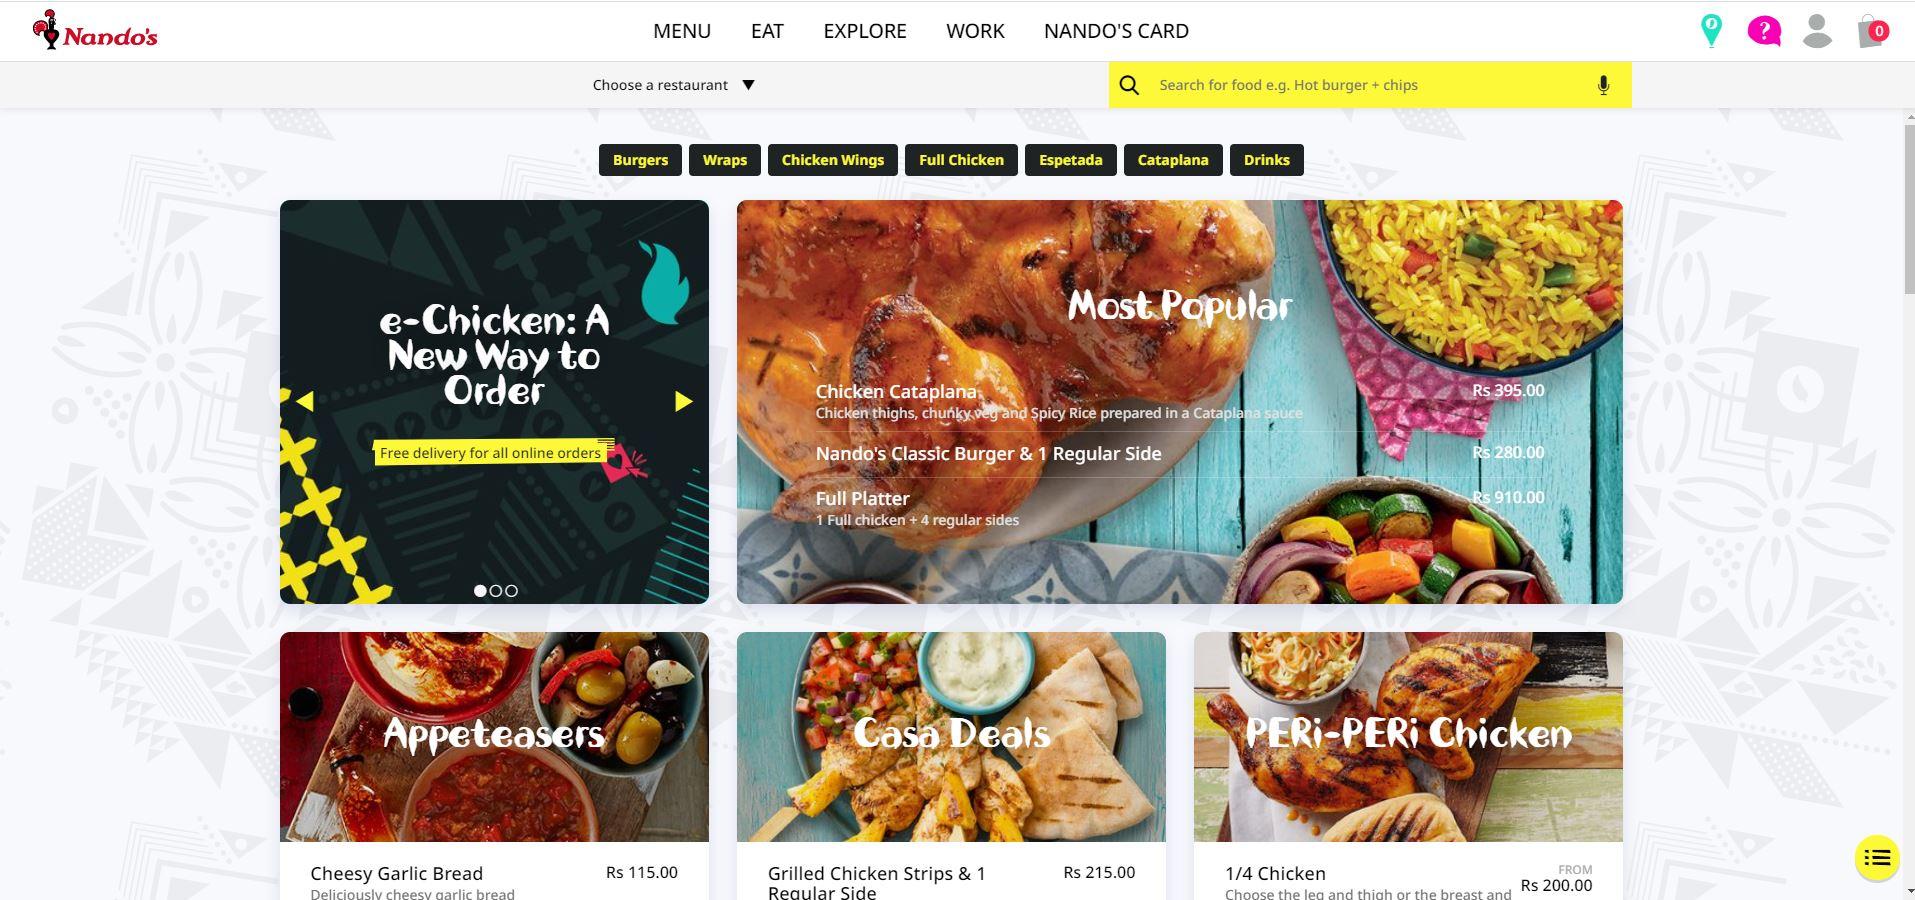 Nandos-Mauritius-Digital-Marketing-Mauritius-Ecommerce-Fast-Food